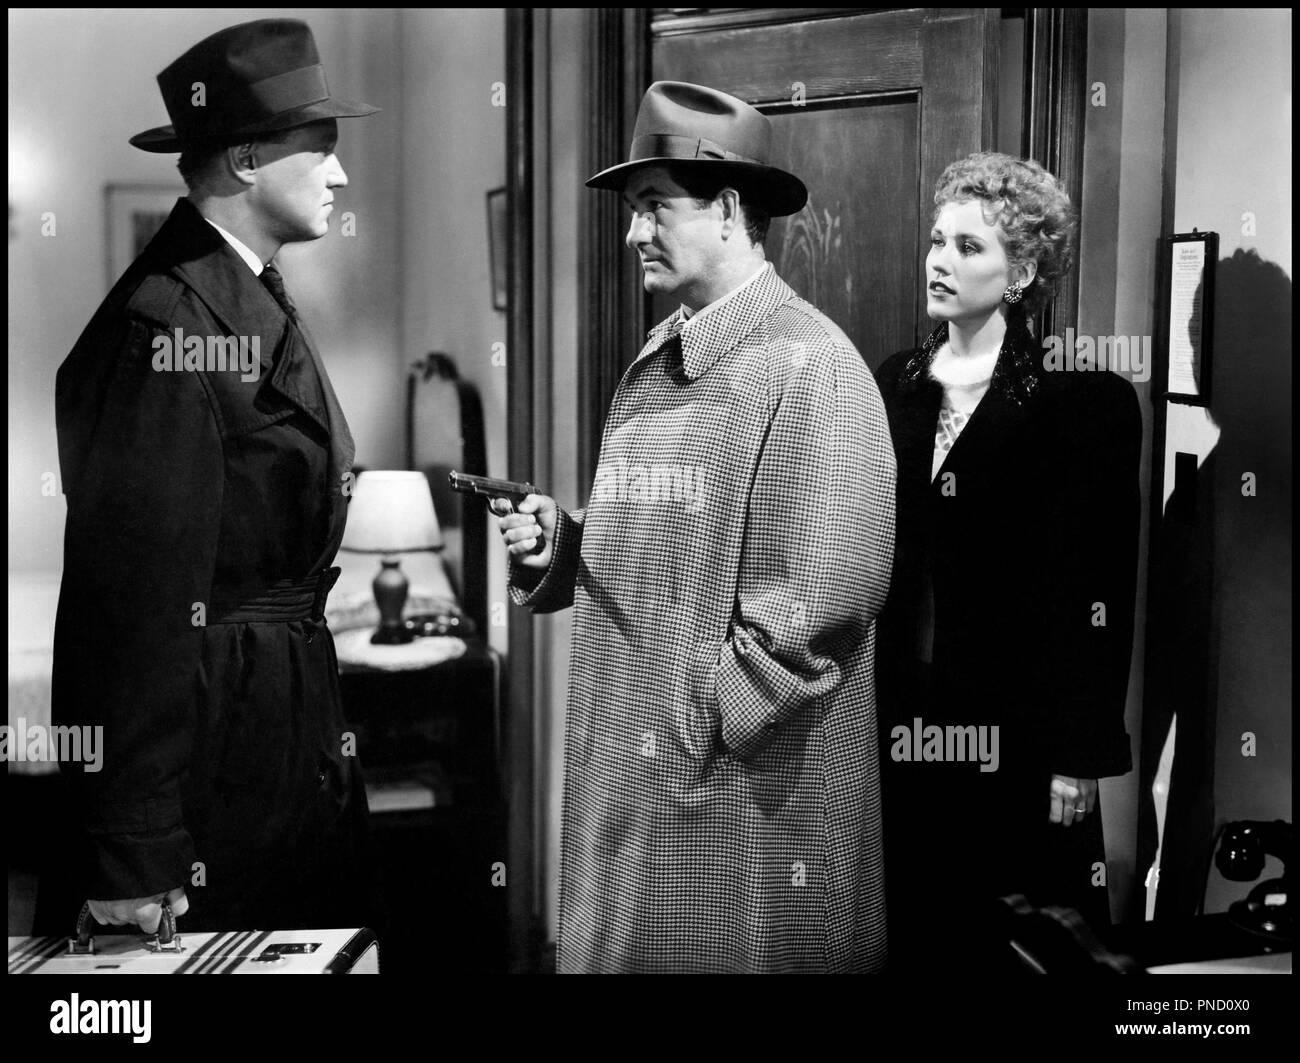 Prod DB © Warner Bros. Pictures / DR GENTLEMAN CAMBRIOLEUR (THE GREAT JEWEL ROBBER) de Peter Godfrey 1950 USA avec David Brian braquer - Stock Image